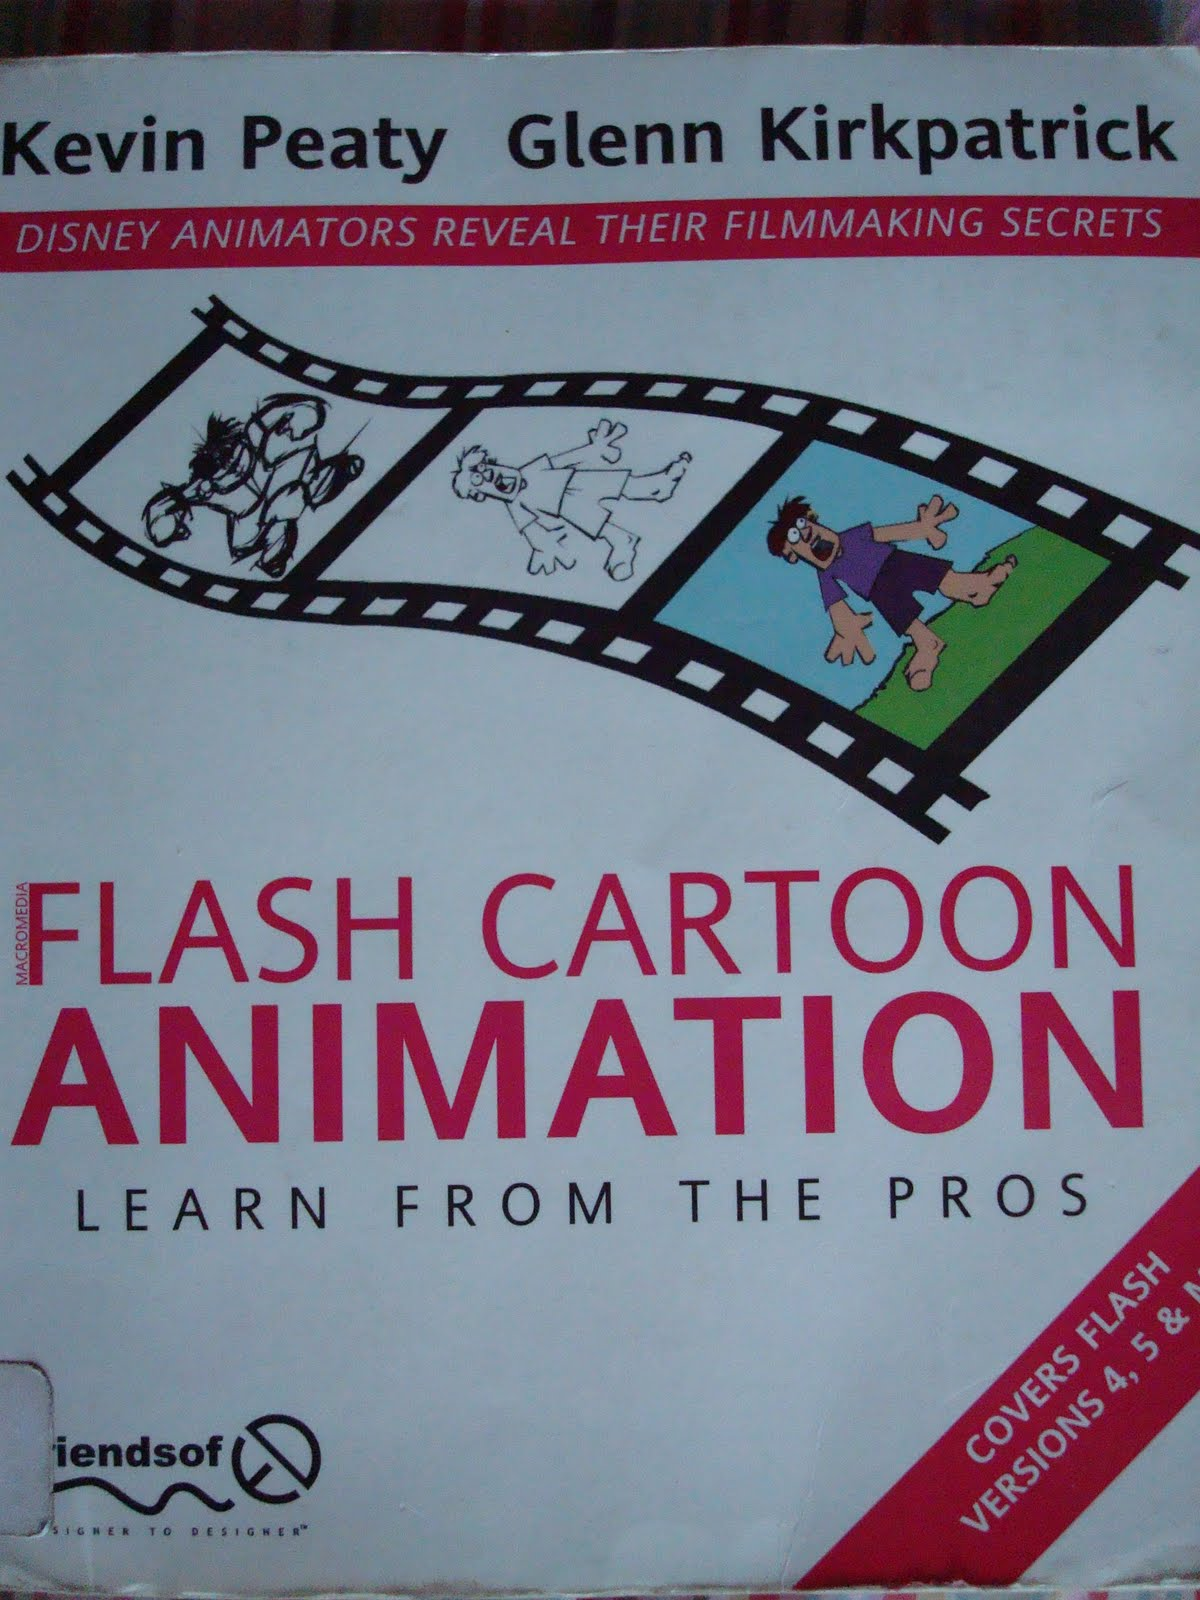 FLASH CARTOON ANIMATION BOOK PDF DOWNLOAD